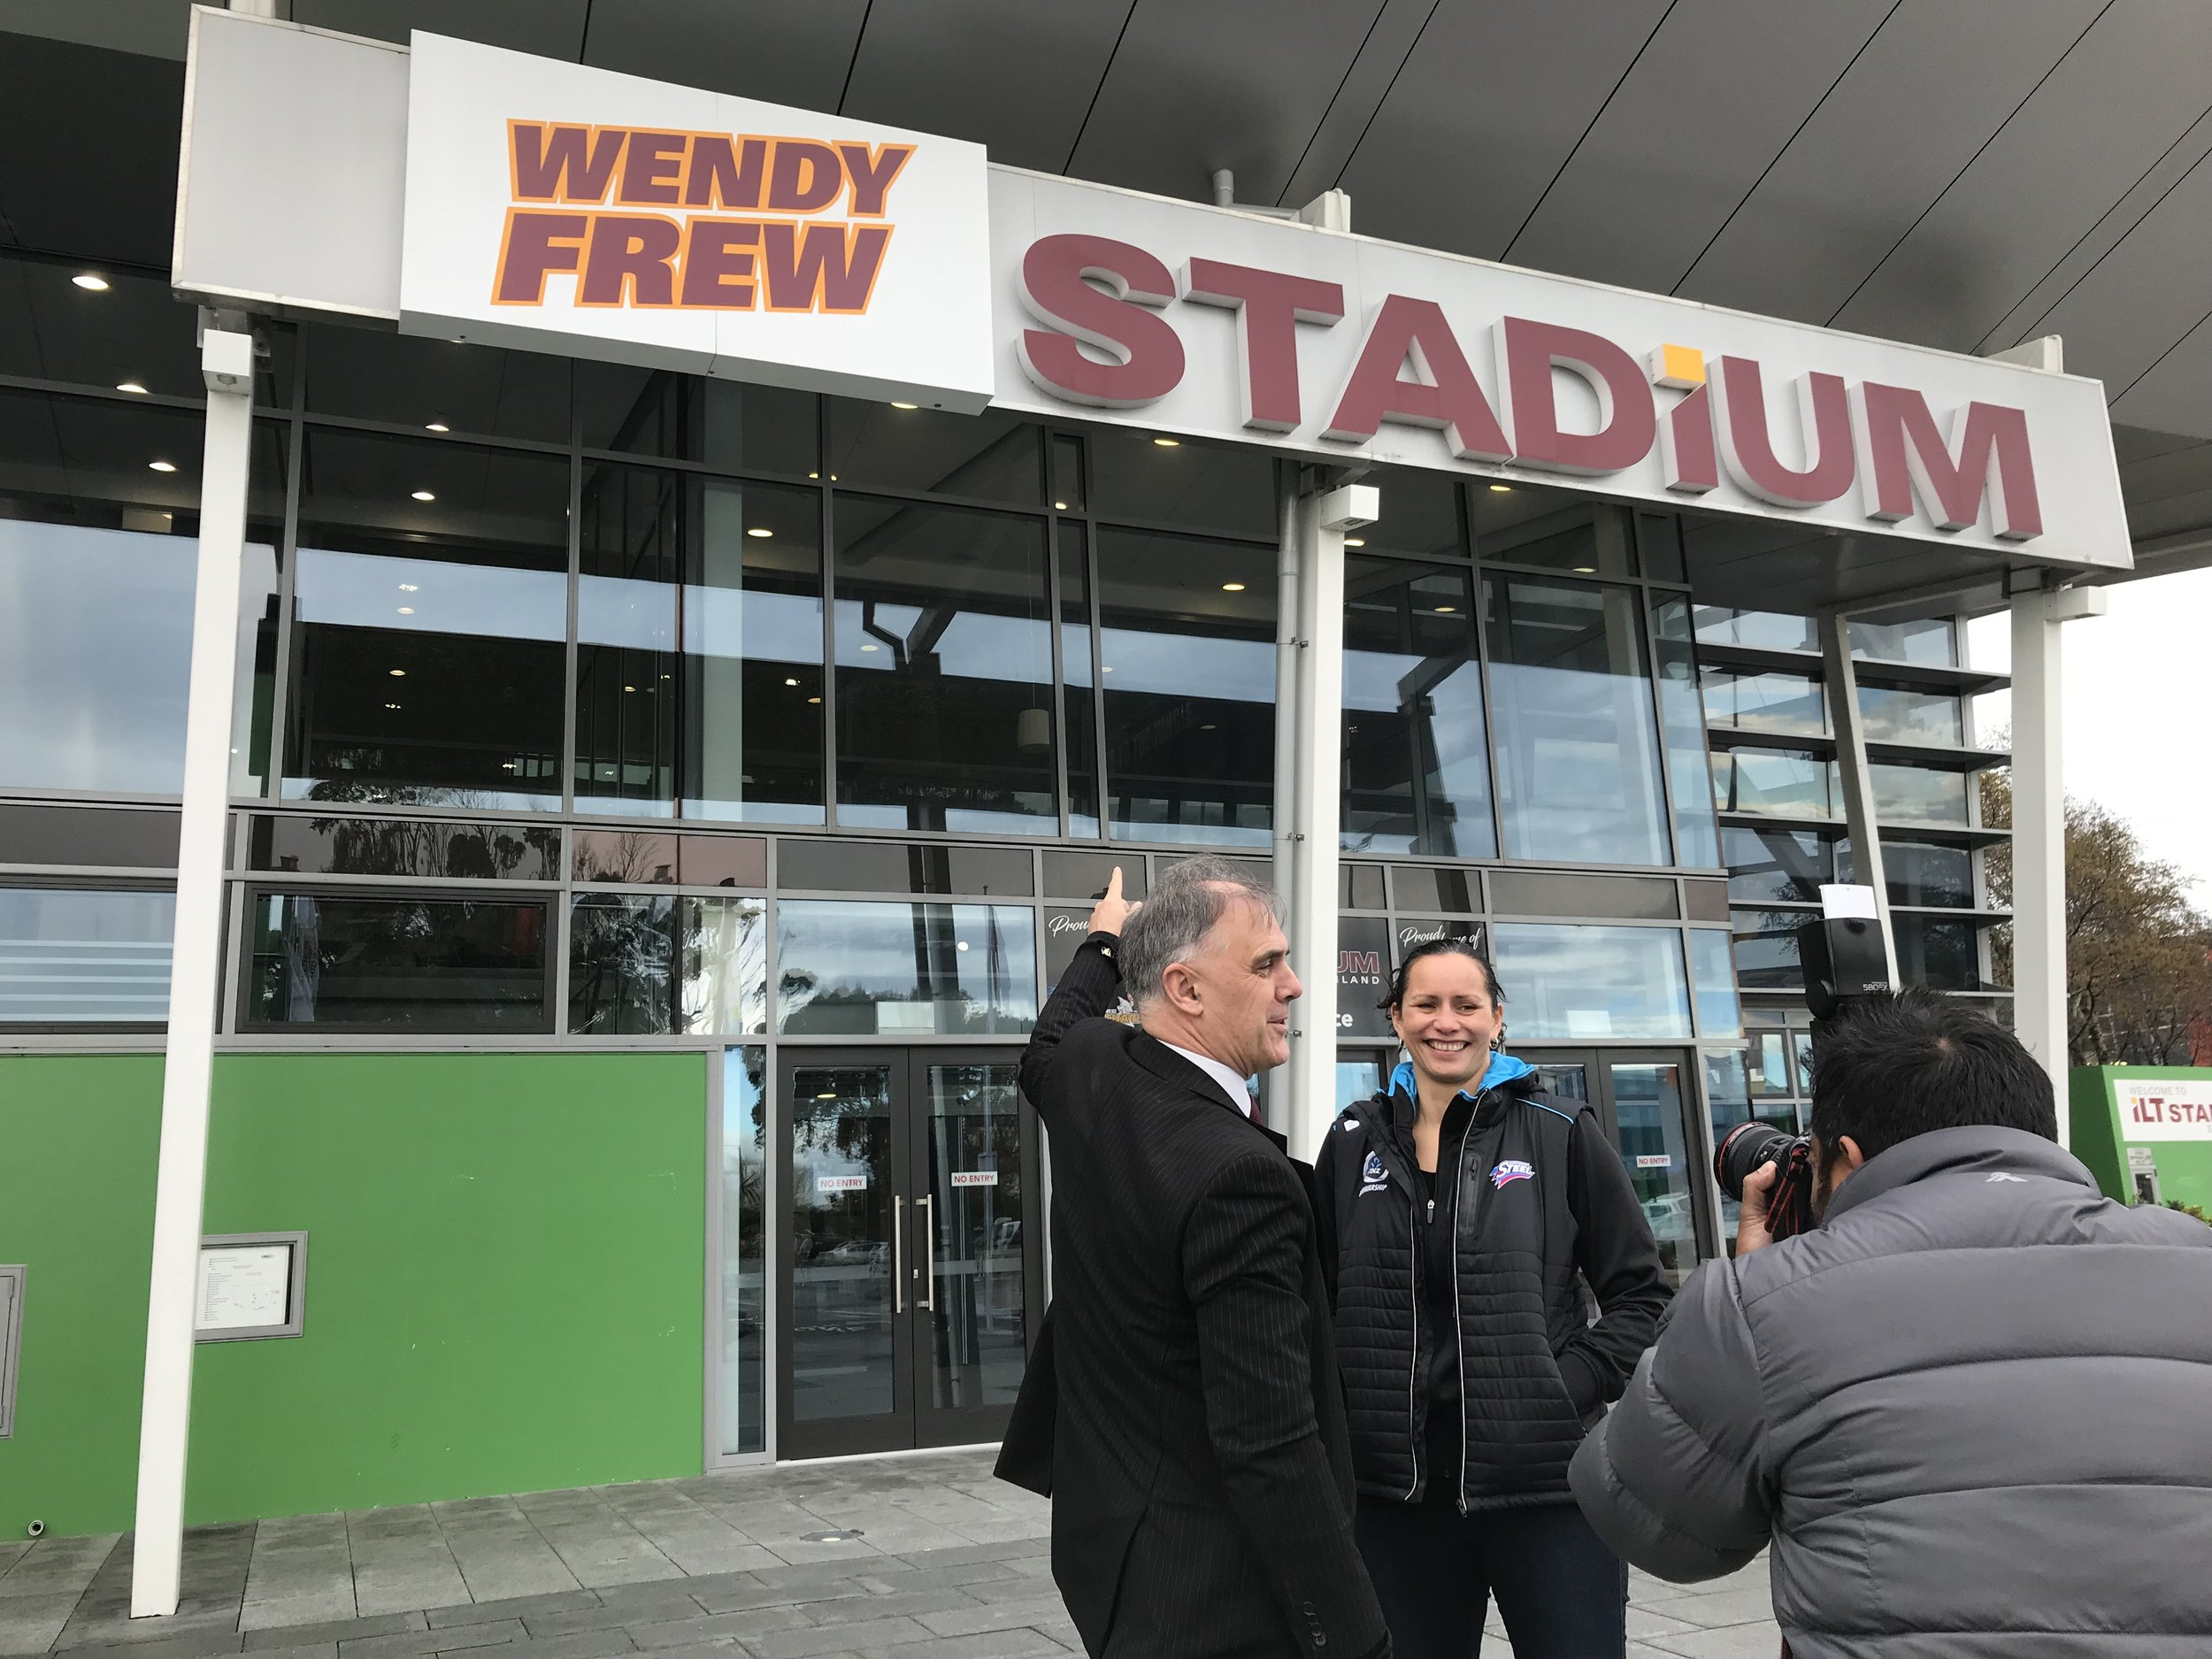 Photo: ILT Stadium Southland general manager Nigel Skelt and Ascot Park Hotel Southern Steel coach Reinga Bloxham unveiling Wendy Frew Stadium. Pic: Nathan Burdon